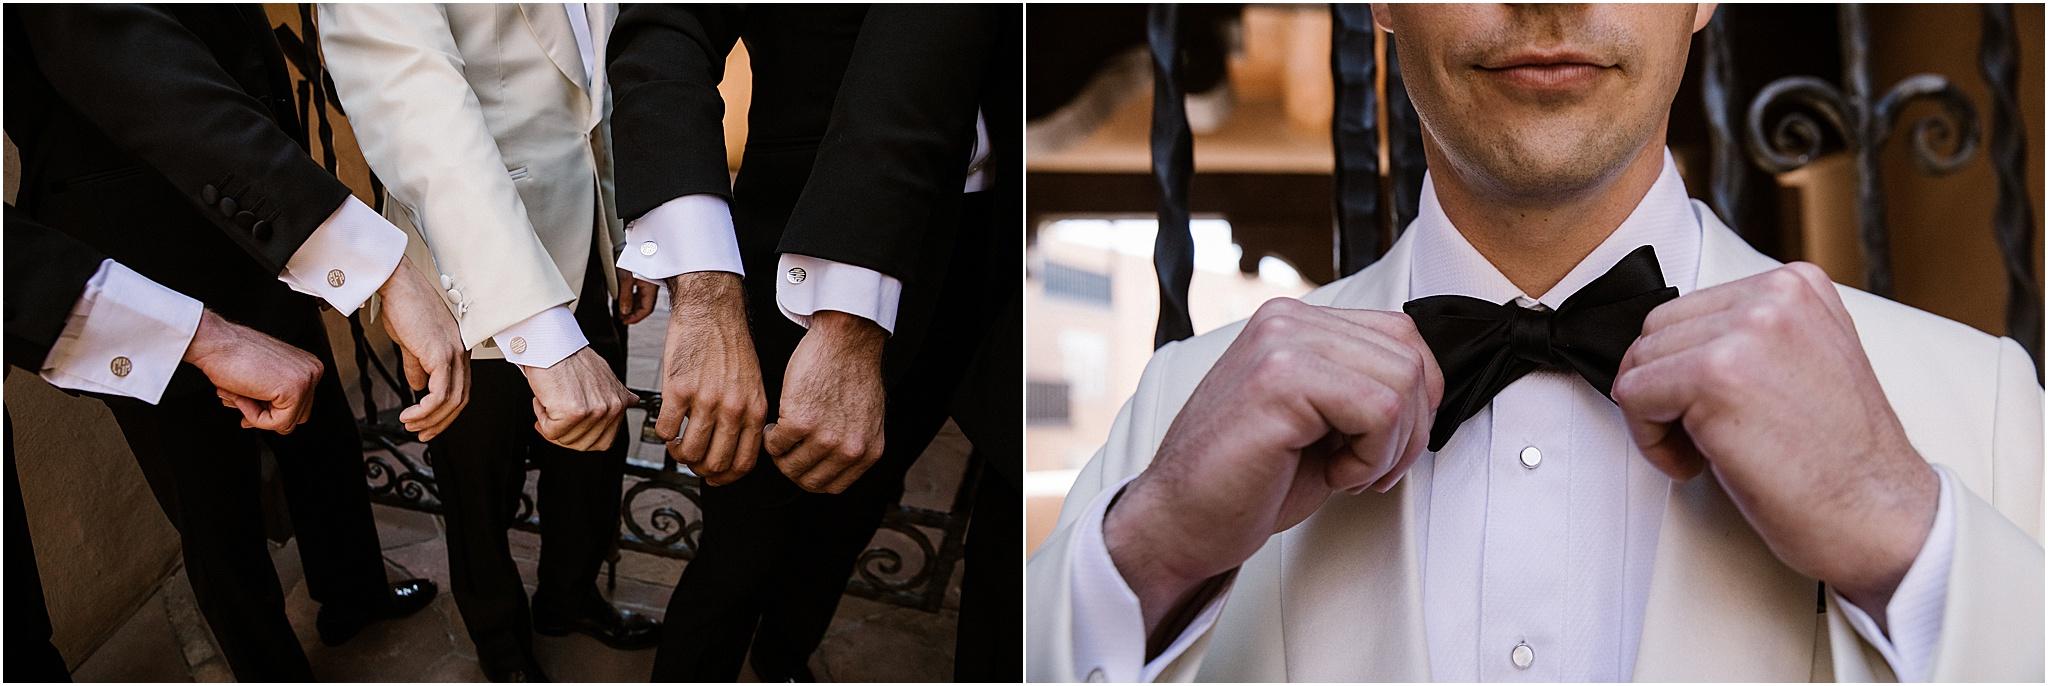 BLUE ROSE PHOTOGRAPHY SANTA FE WEDDING_13